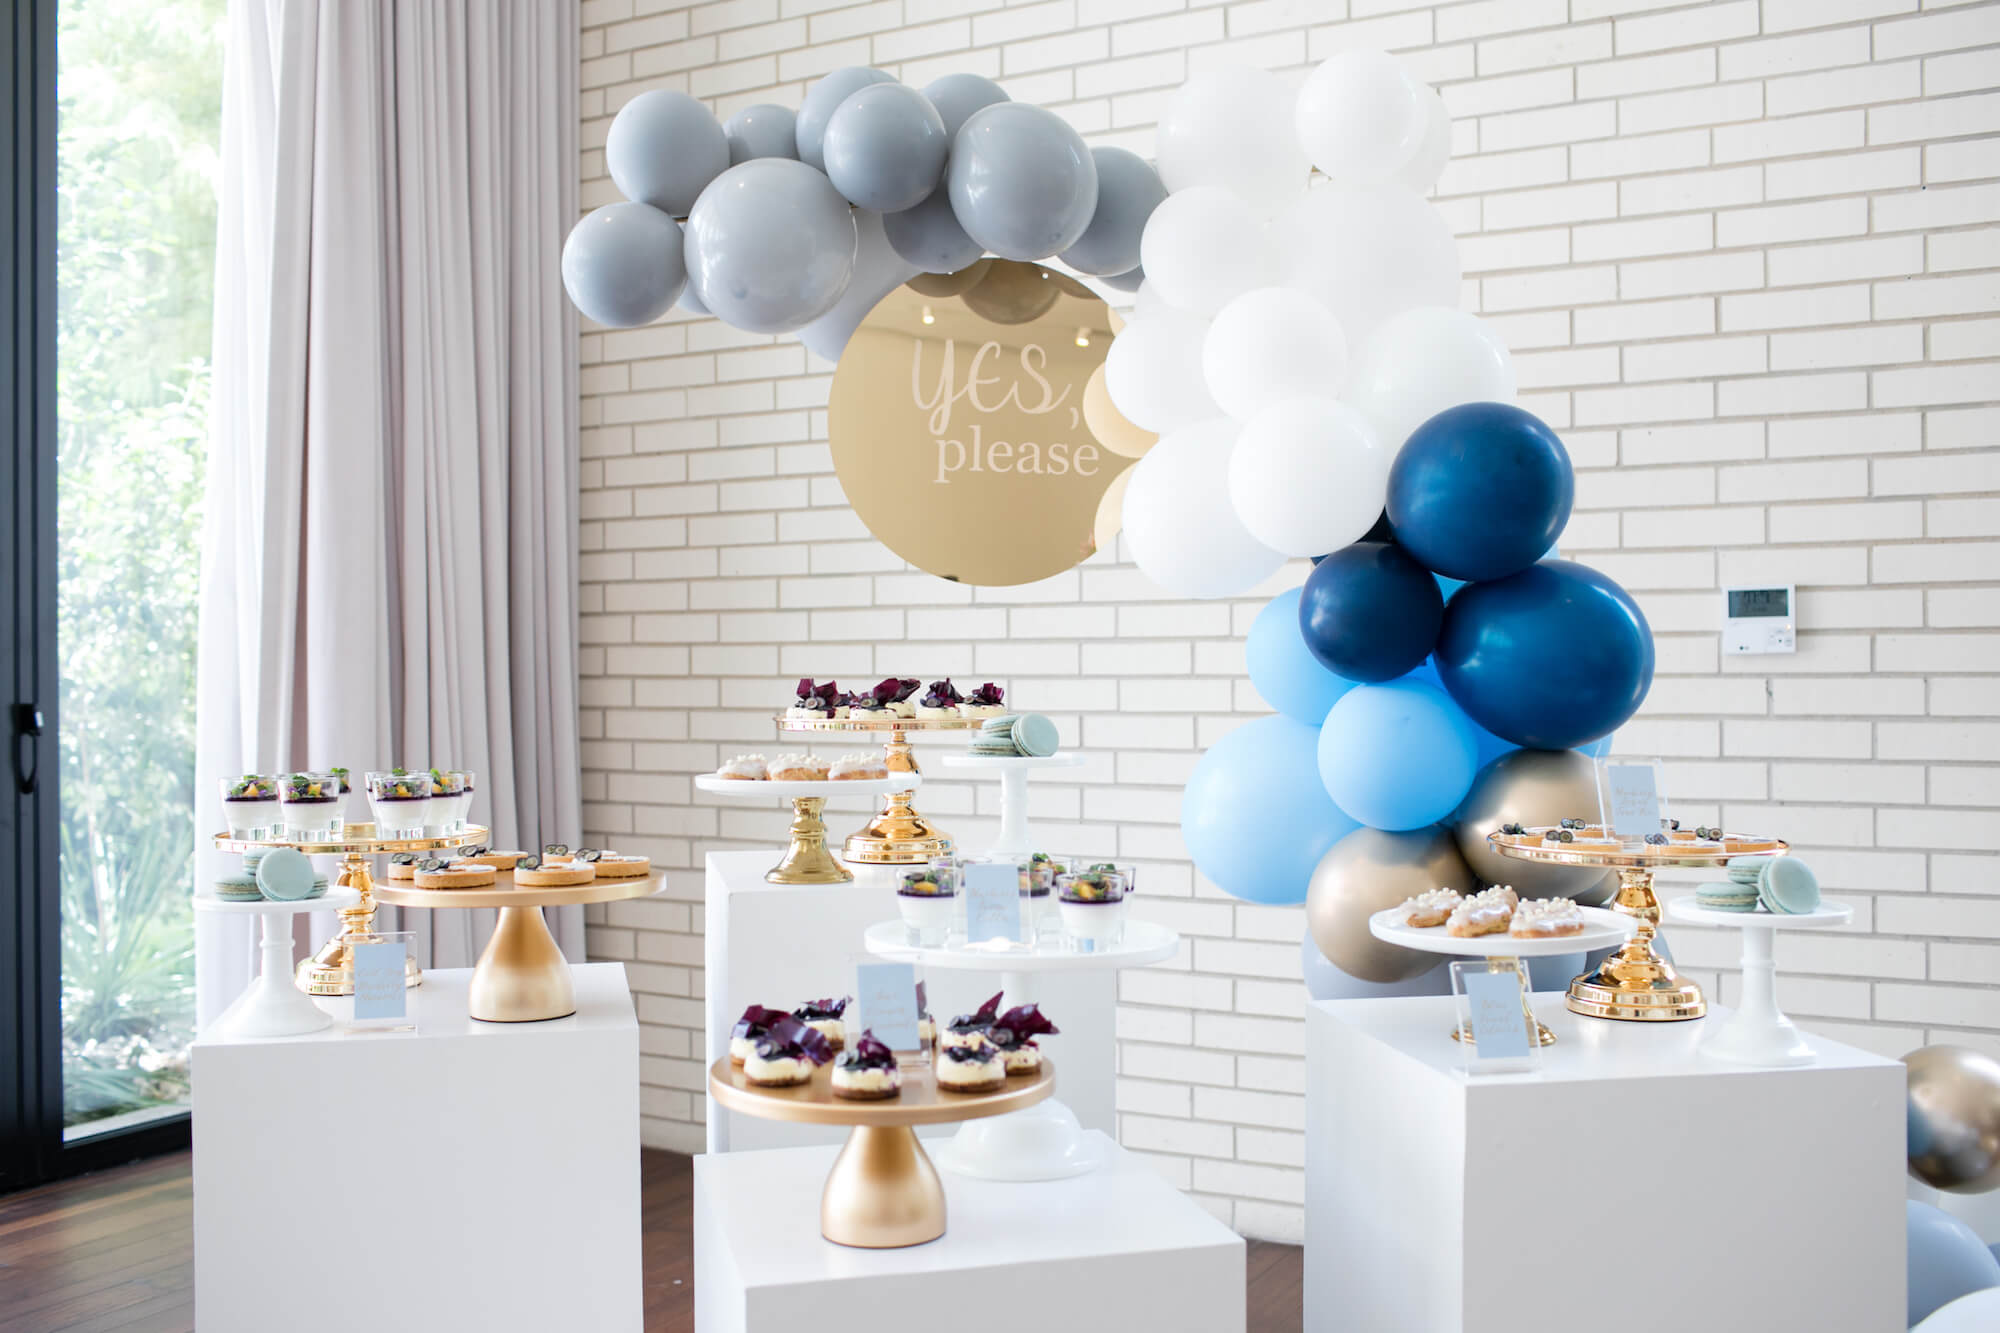 TSG_Events_Dessert_Affair_0023 copy.jpg